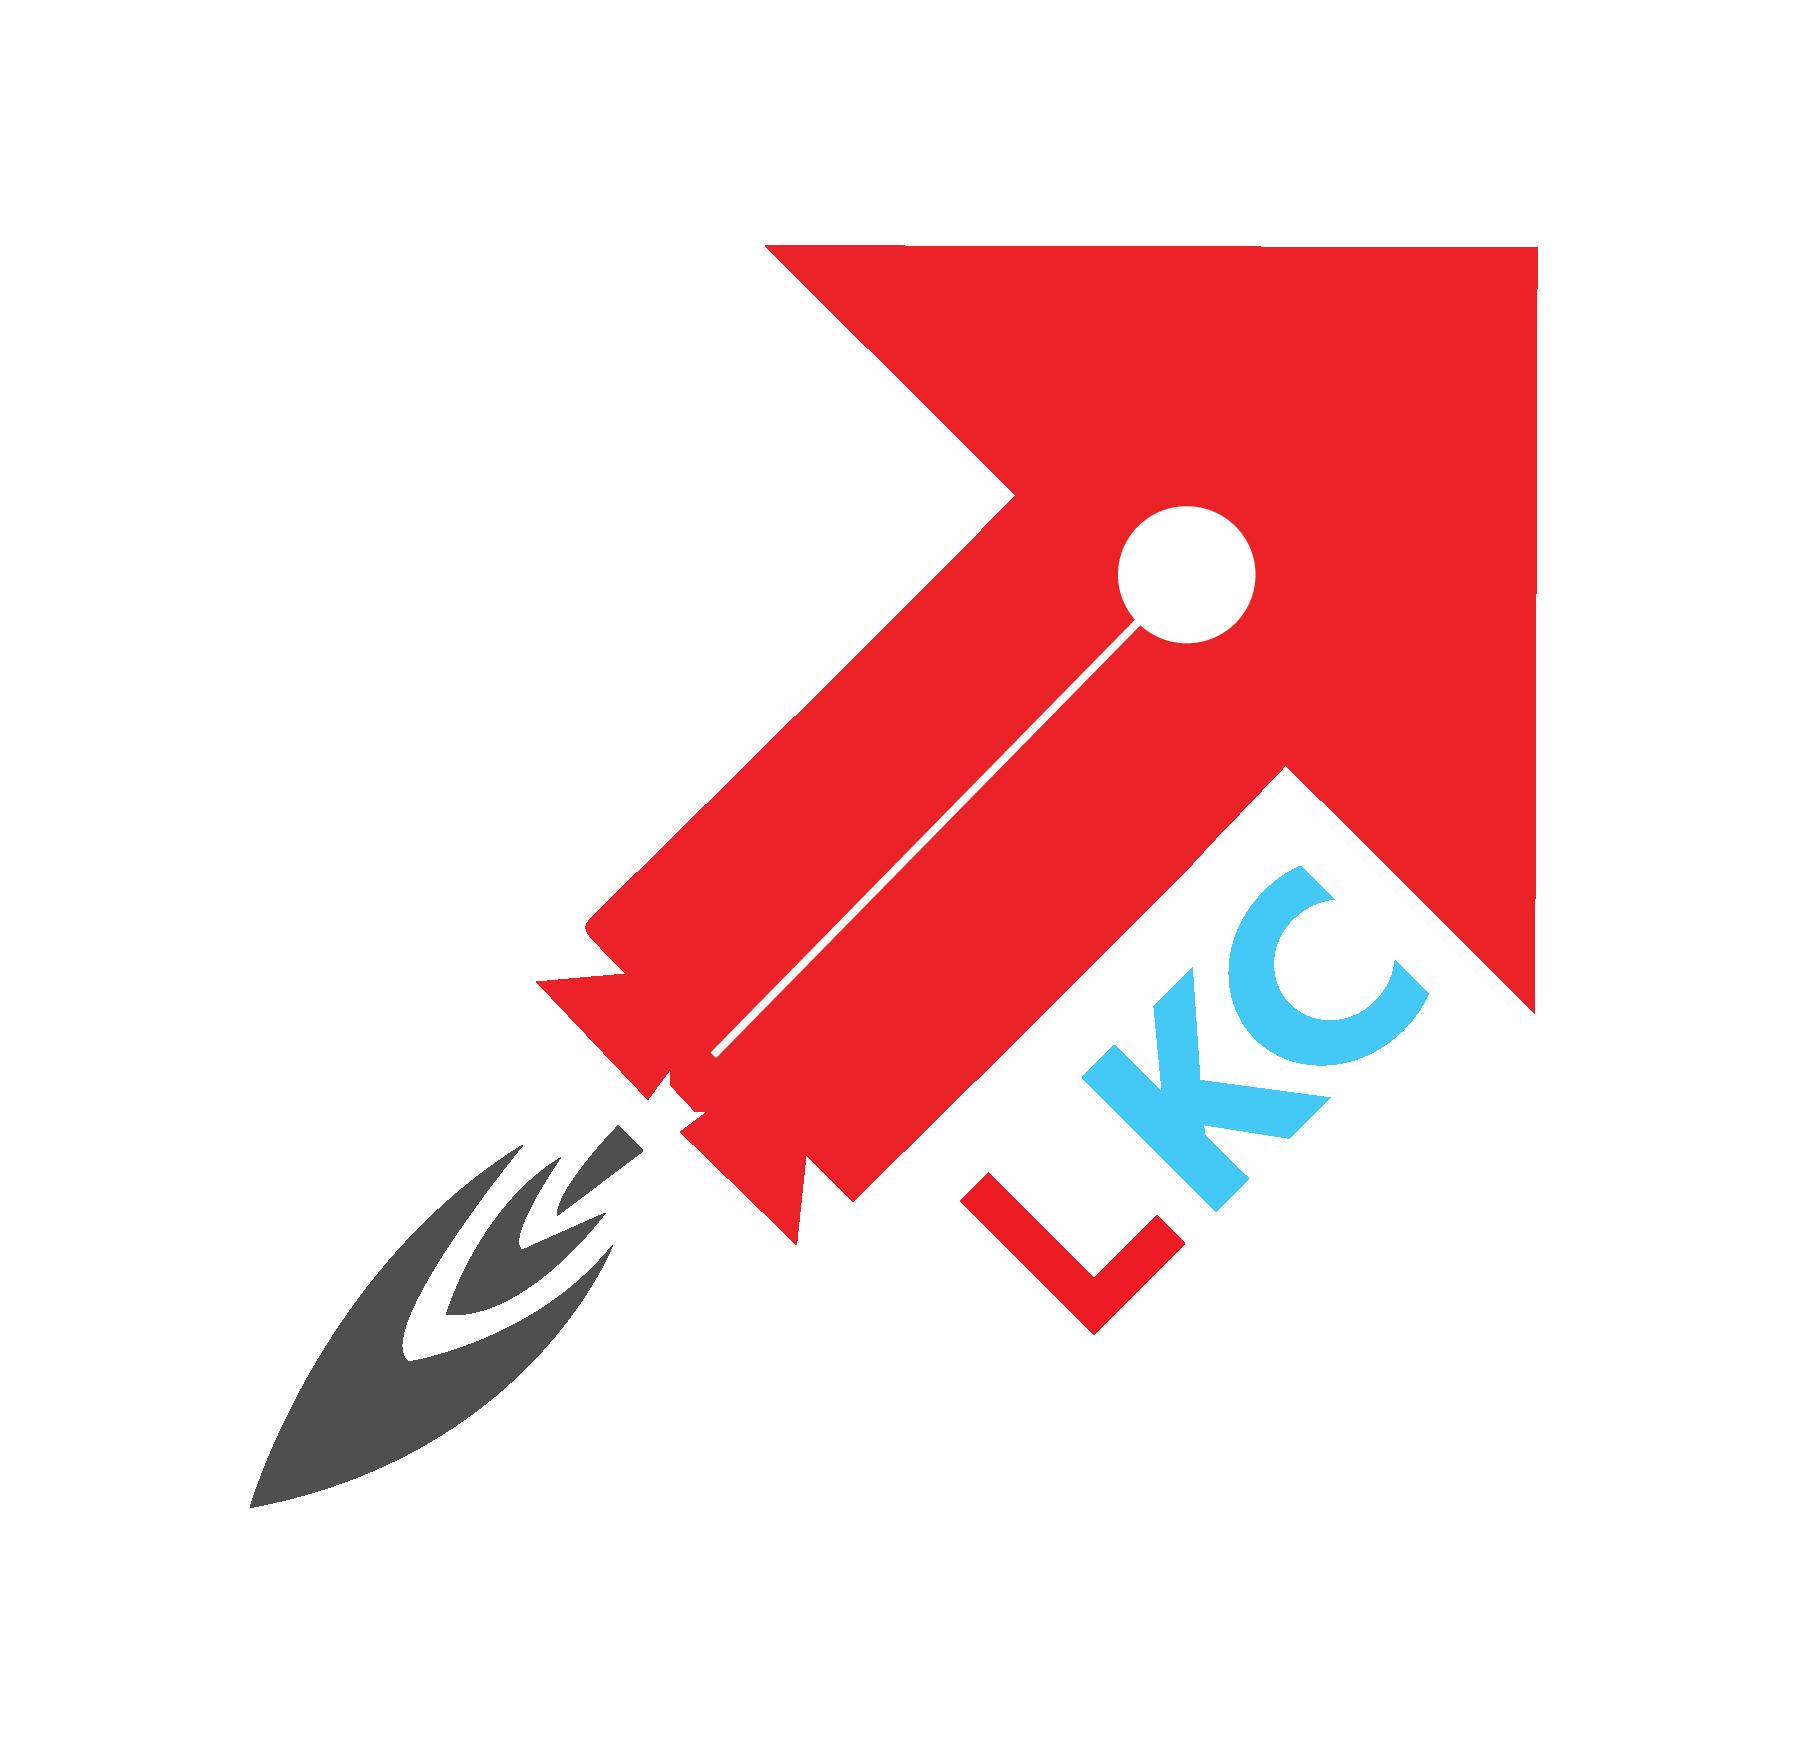 www.launchkc.com